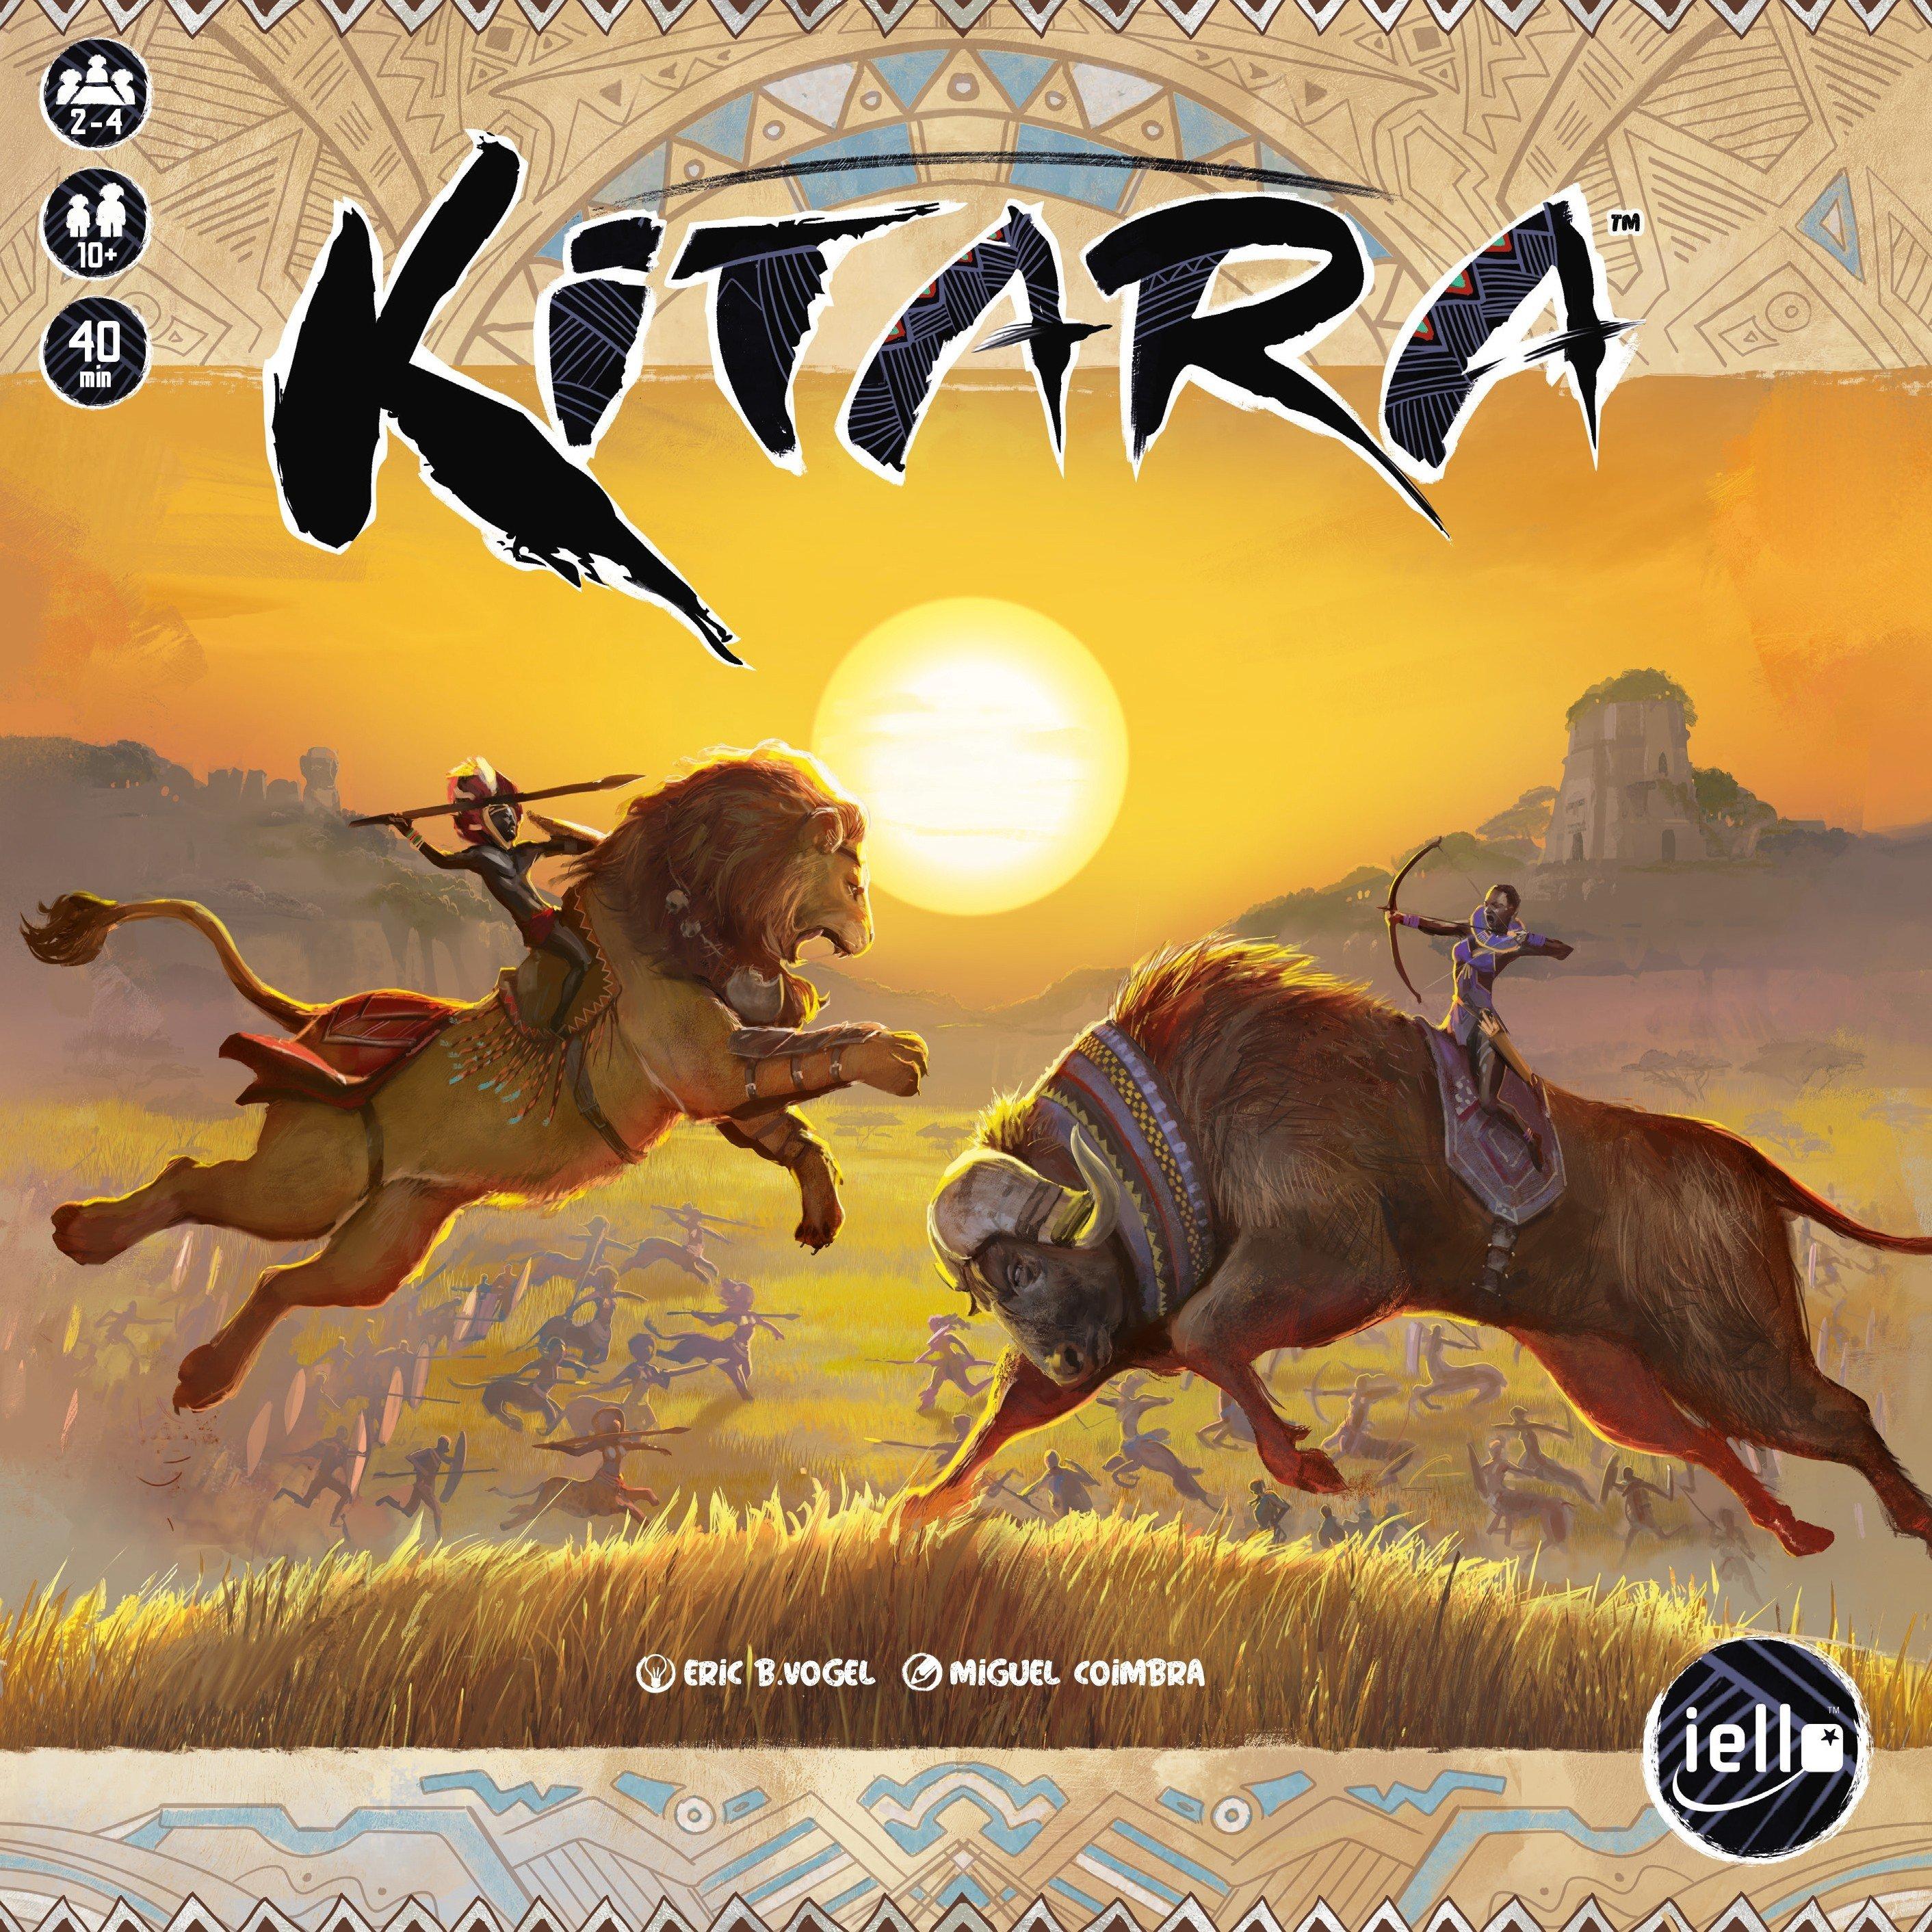 Kitara 2020 Board Game